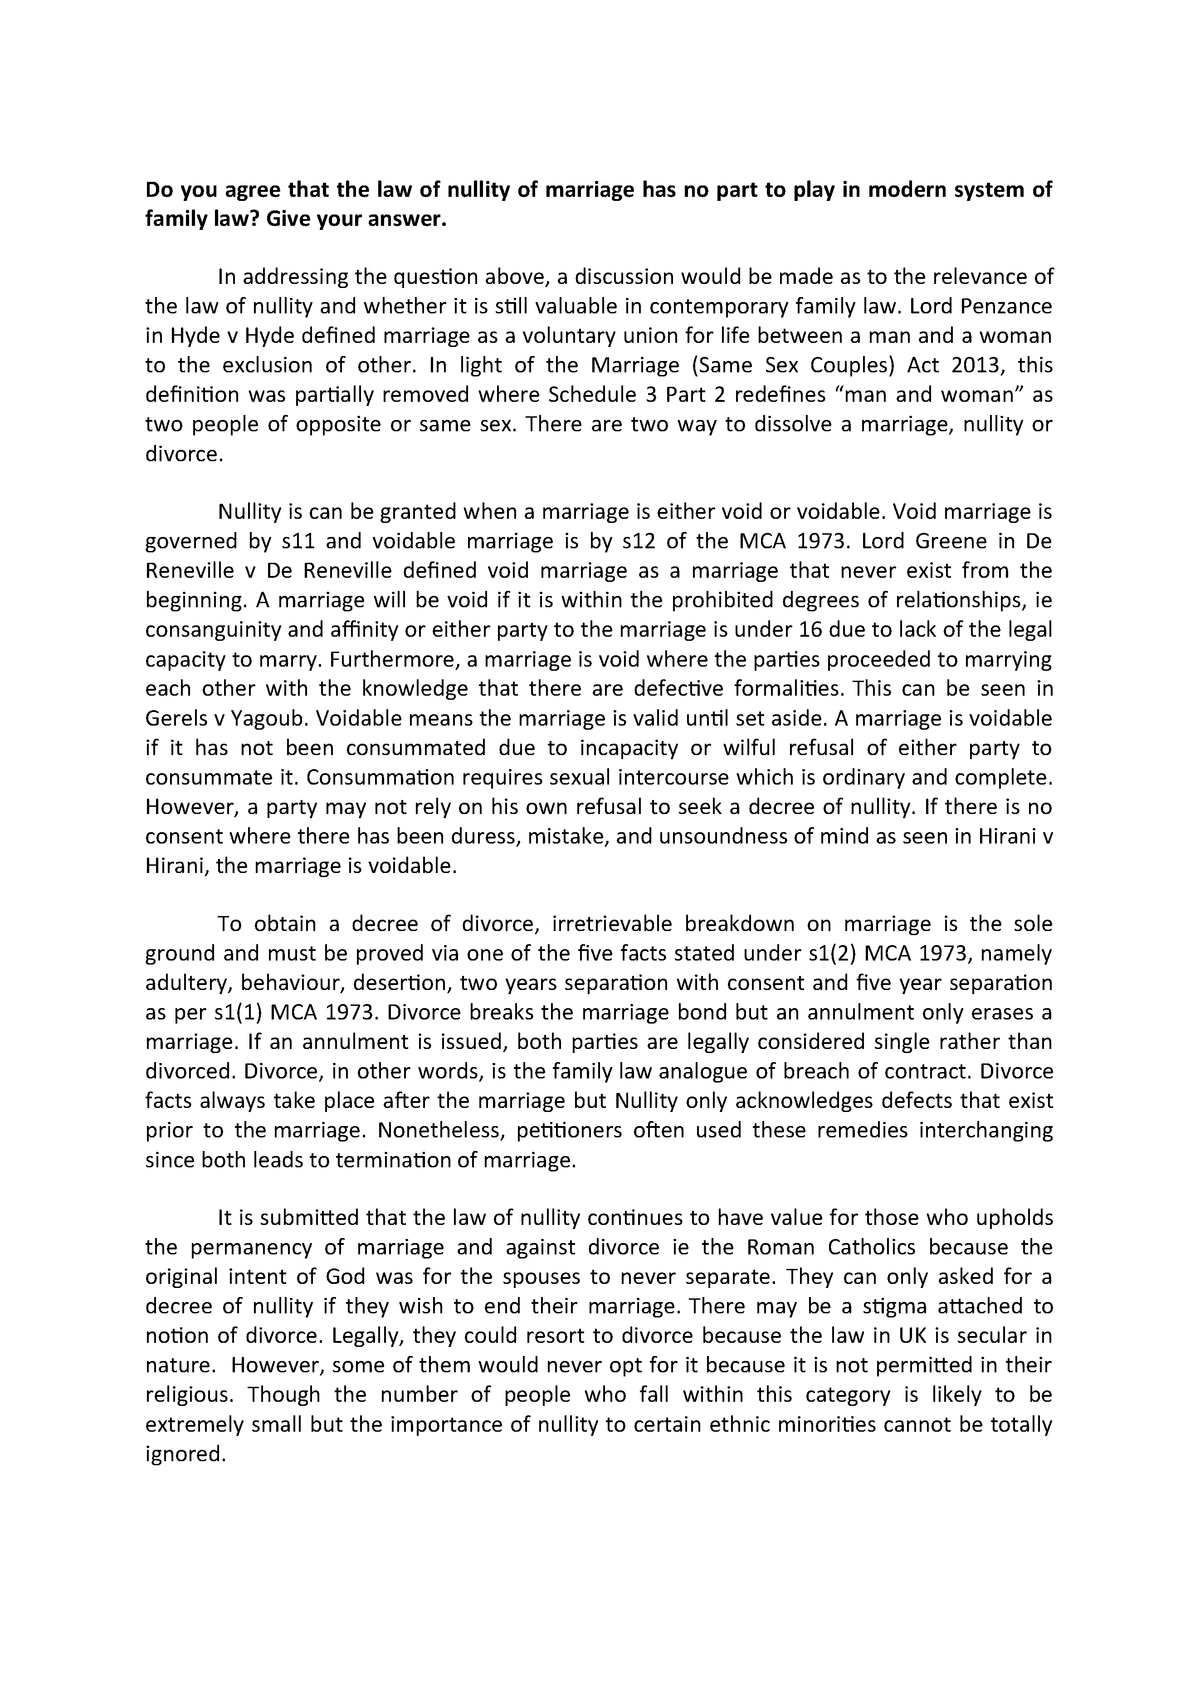 Essay for Nullity - Grade: B+ - Family Law LA0756 - StuDocu